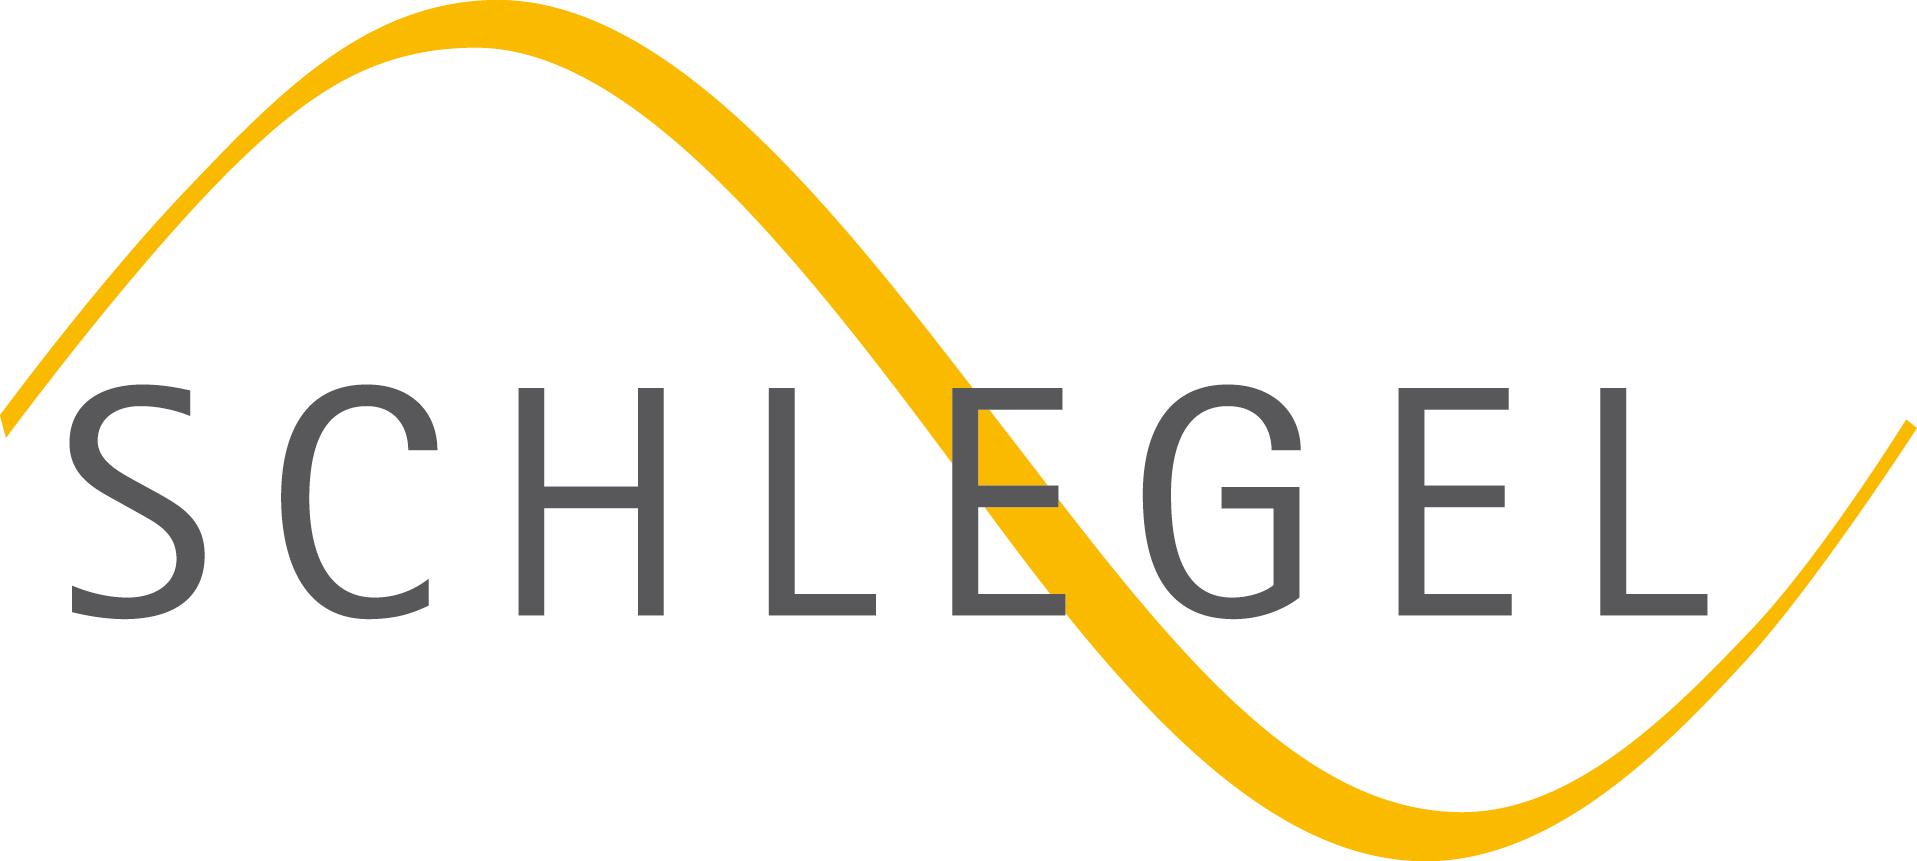 ETL Paul Schlegel